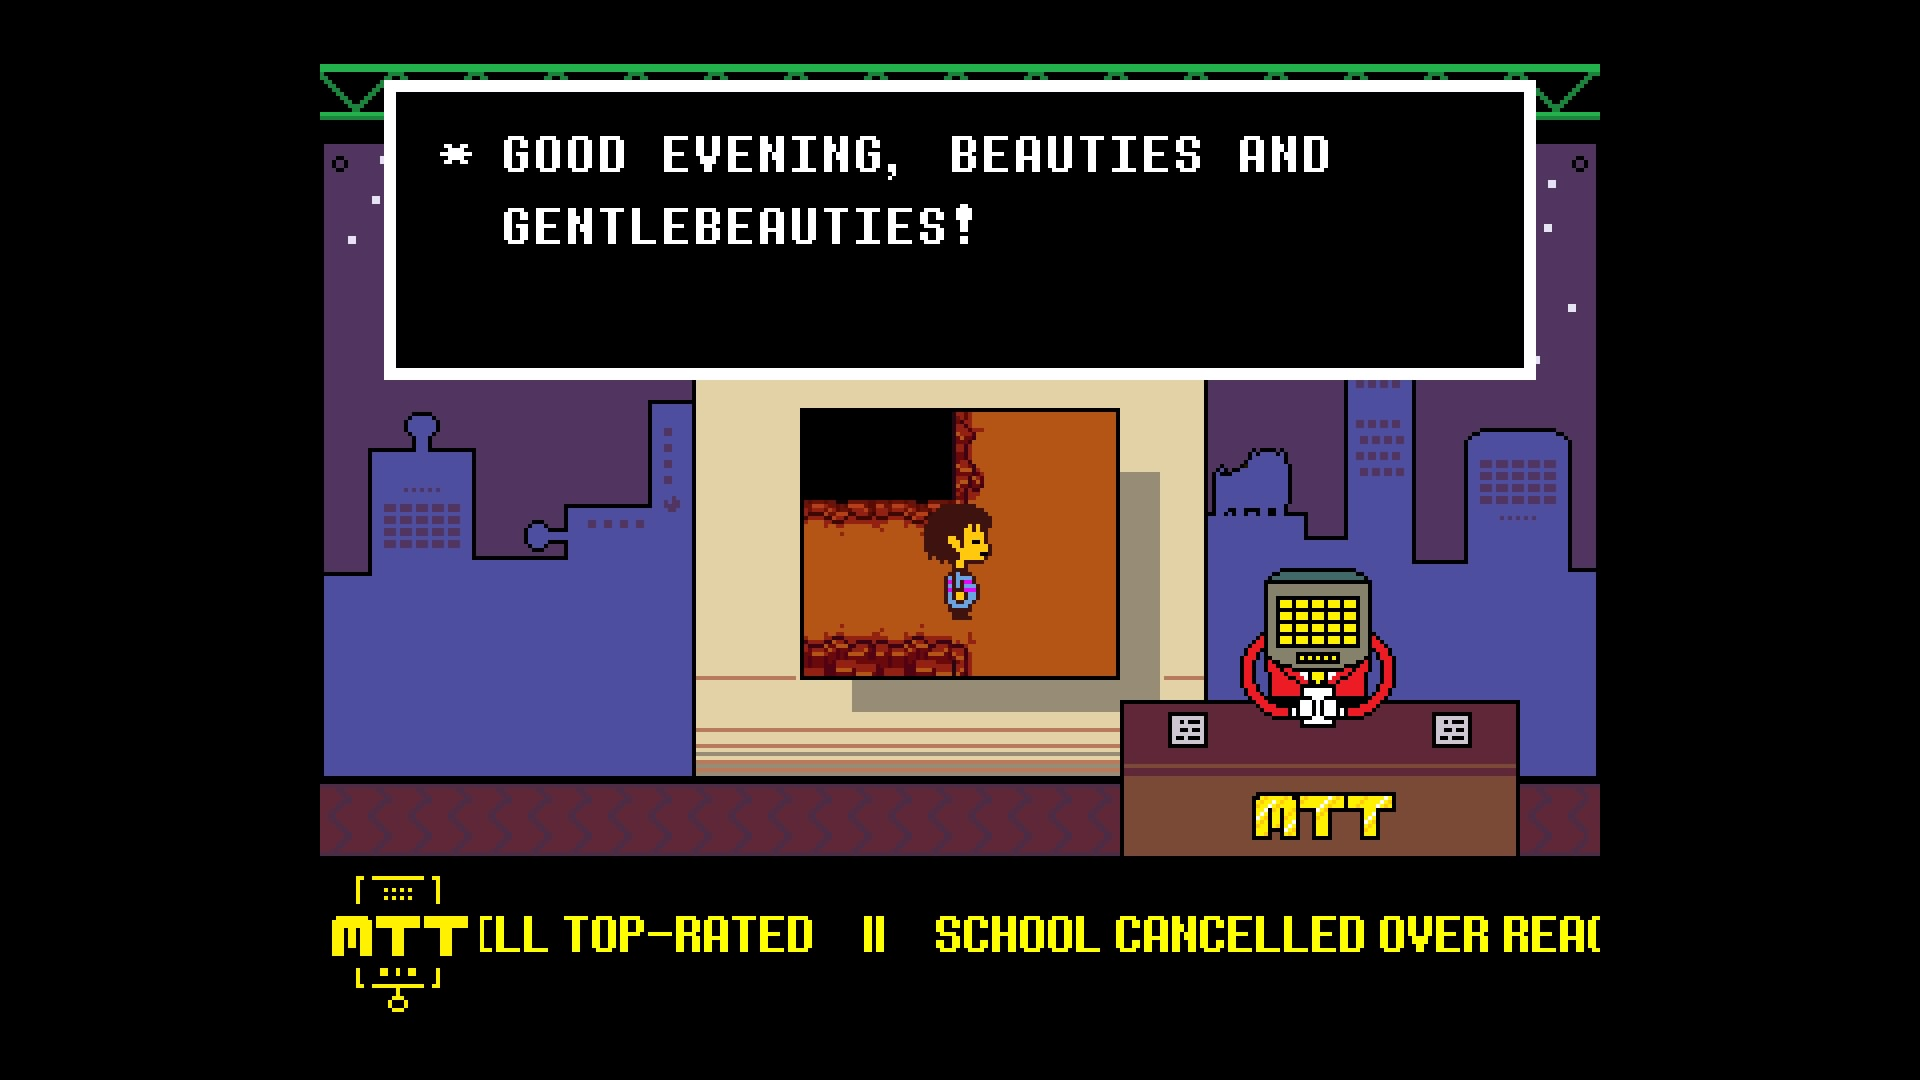 Undertale: Video Games As Art